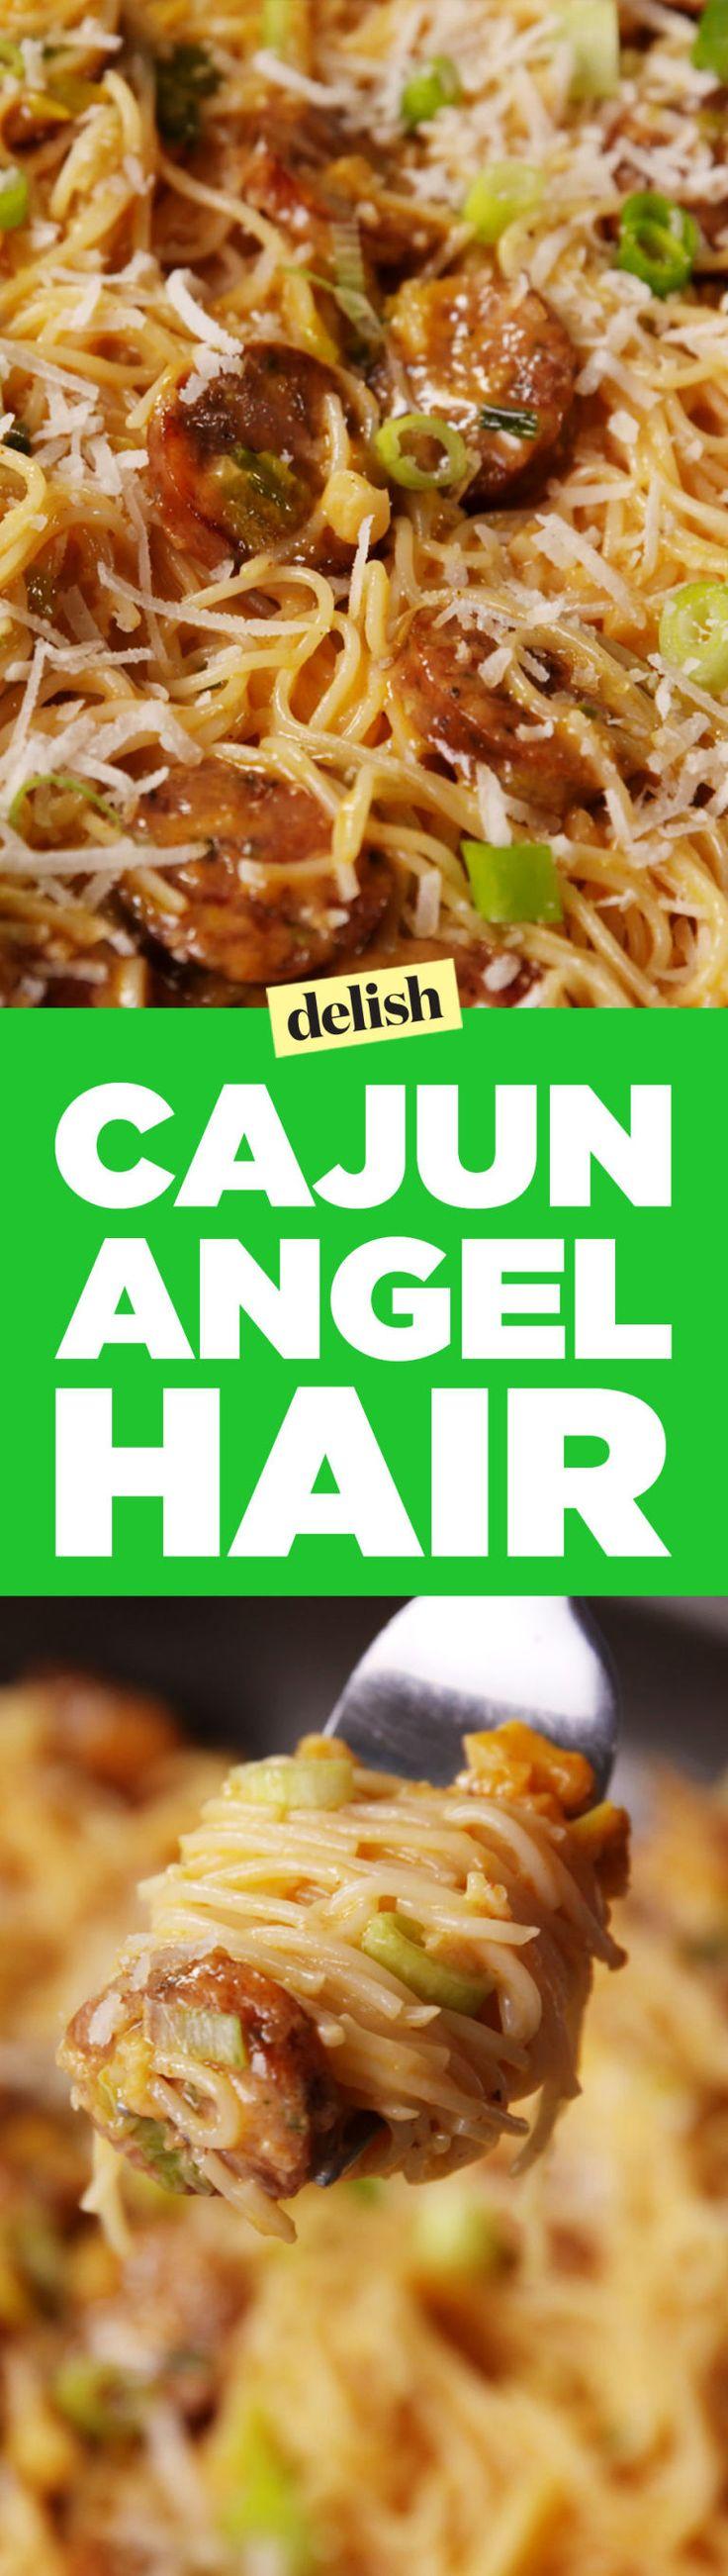 Our Creamy Cajun Angel Hair Has a Kick You Can't Resist  - Delish.com